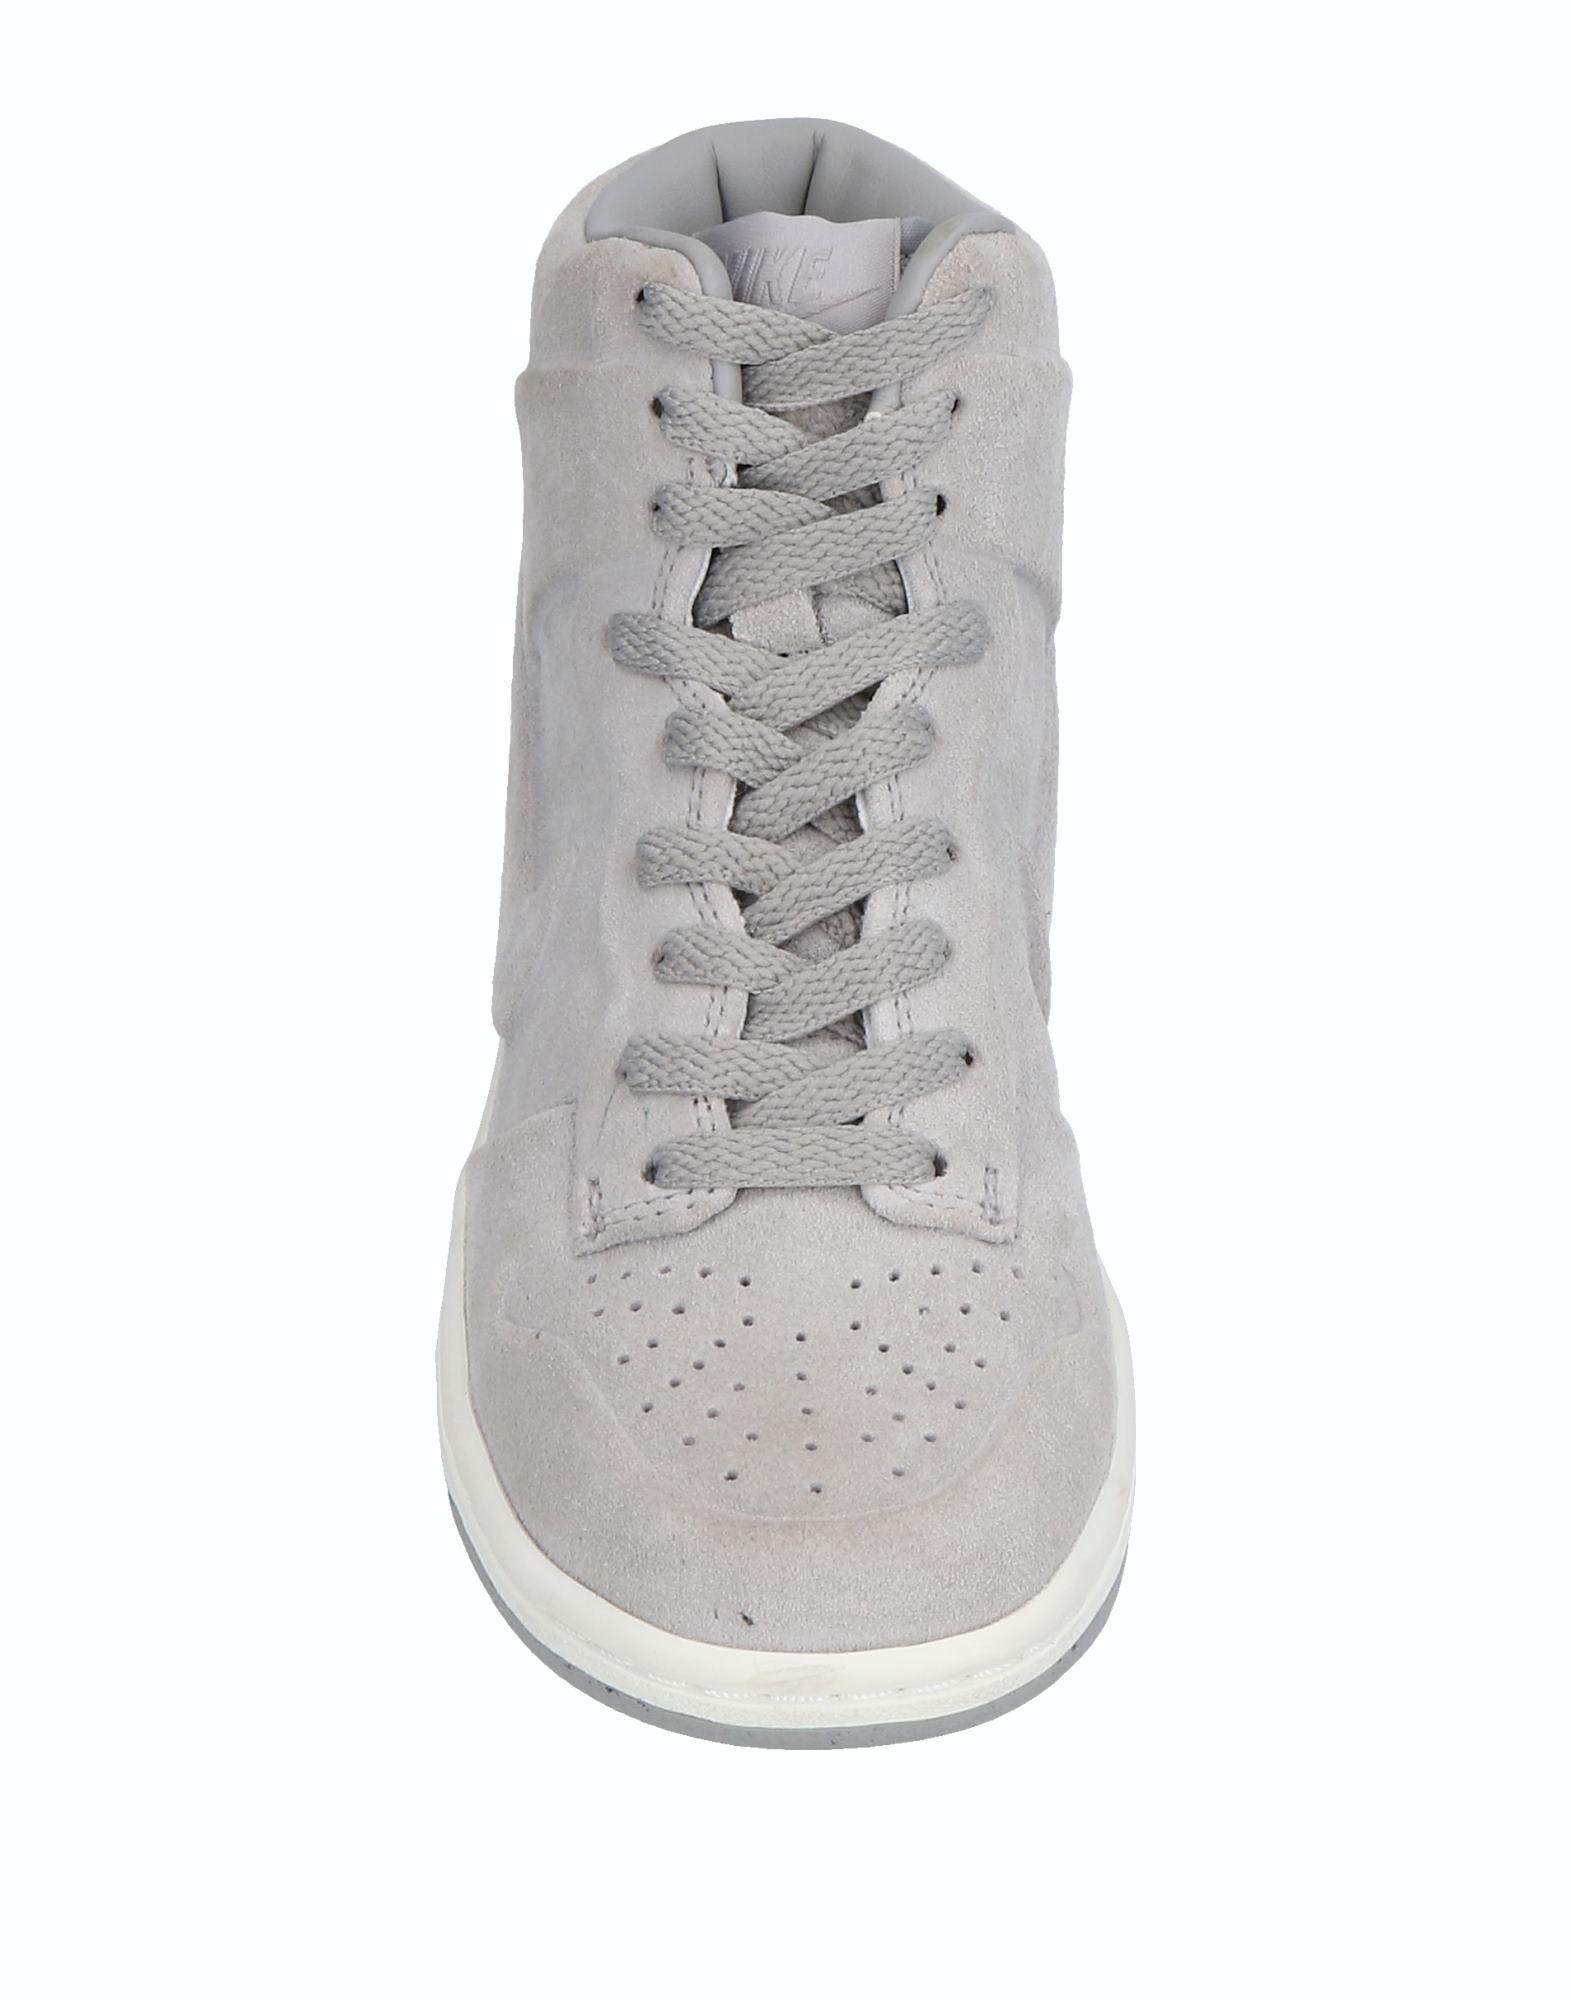 Nike Sneakers Damen Damen Sneakers  11506206OM Gute Qualität beliebte Schuhe e4daf0